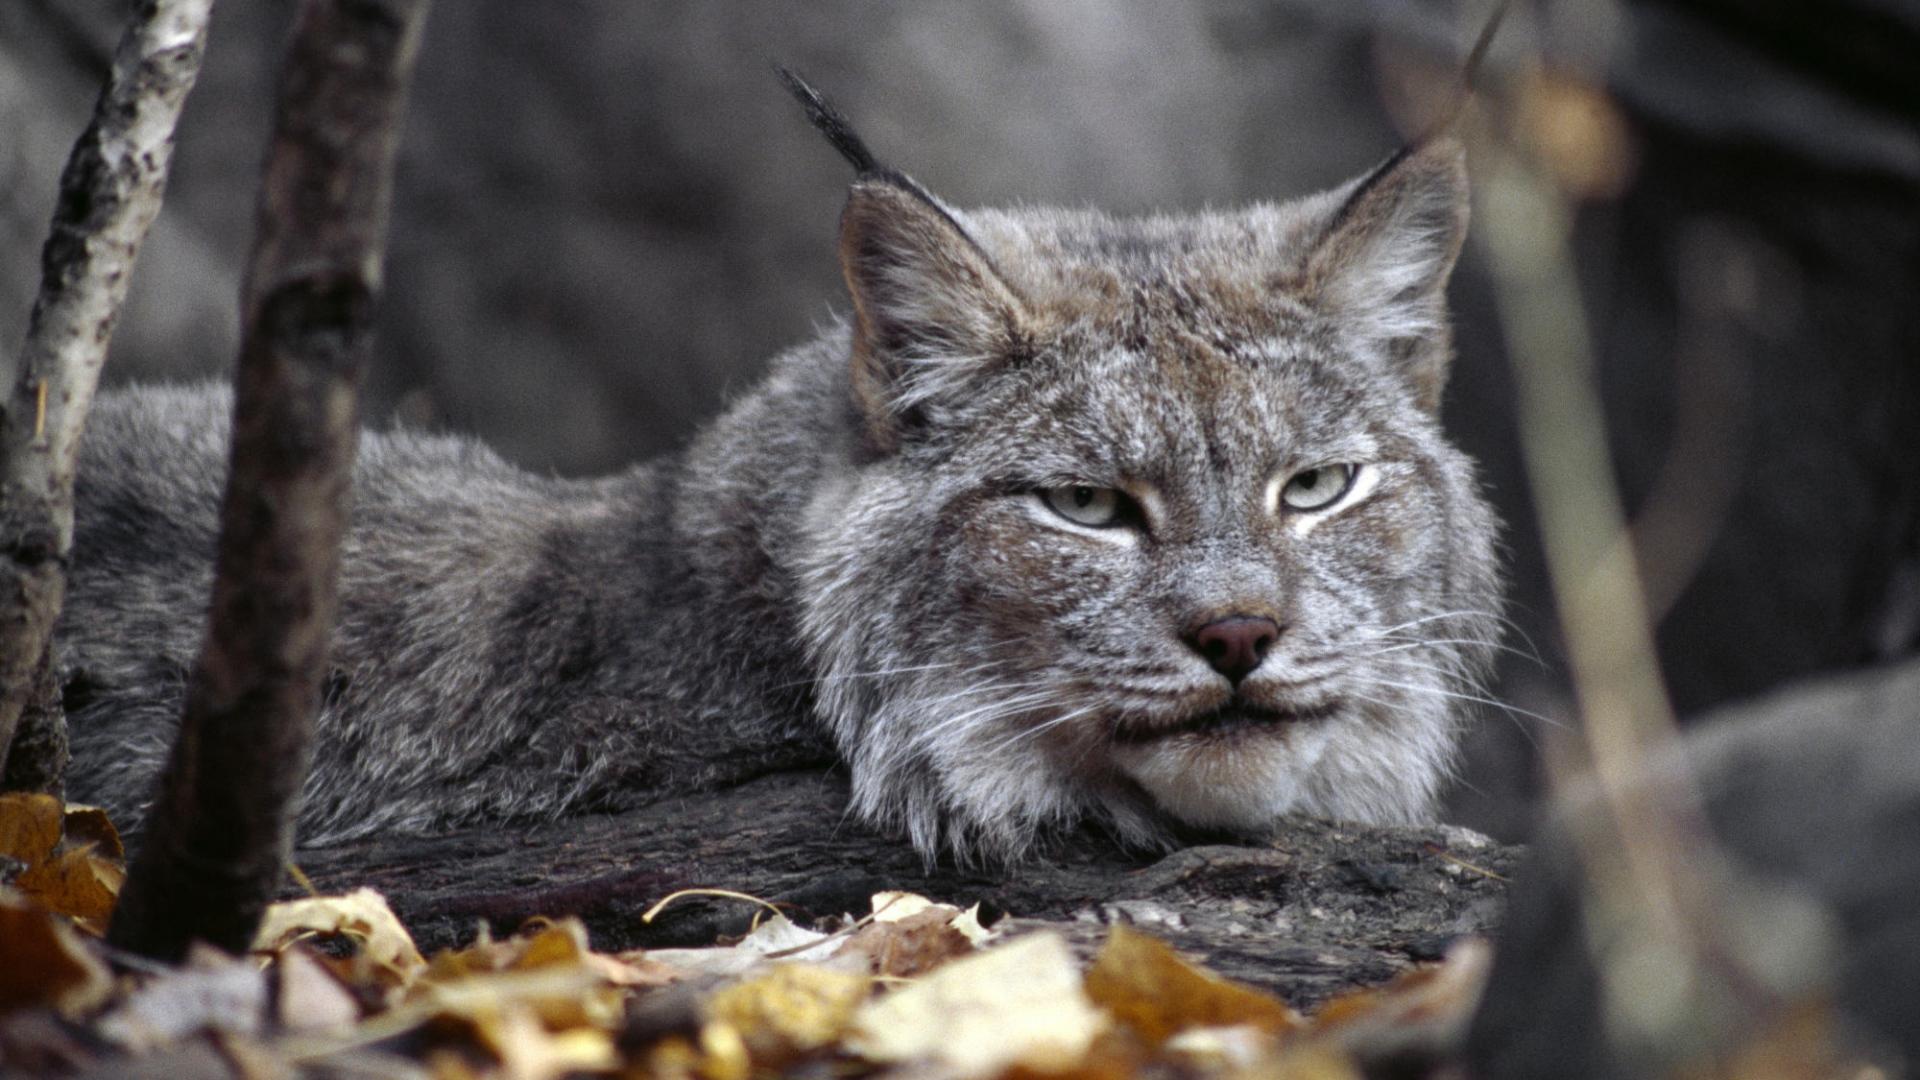 cat lynx autumn foliage - photo #37